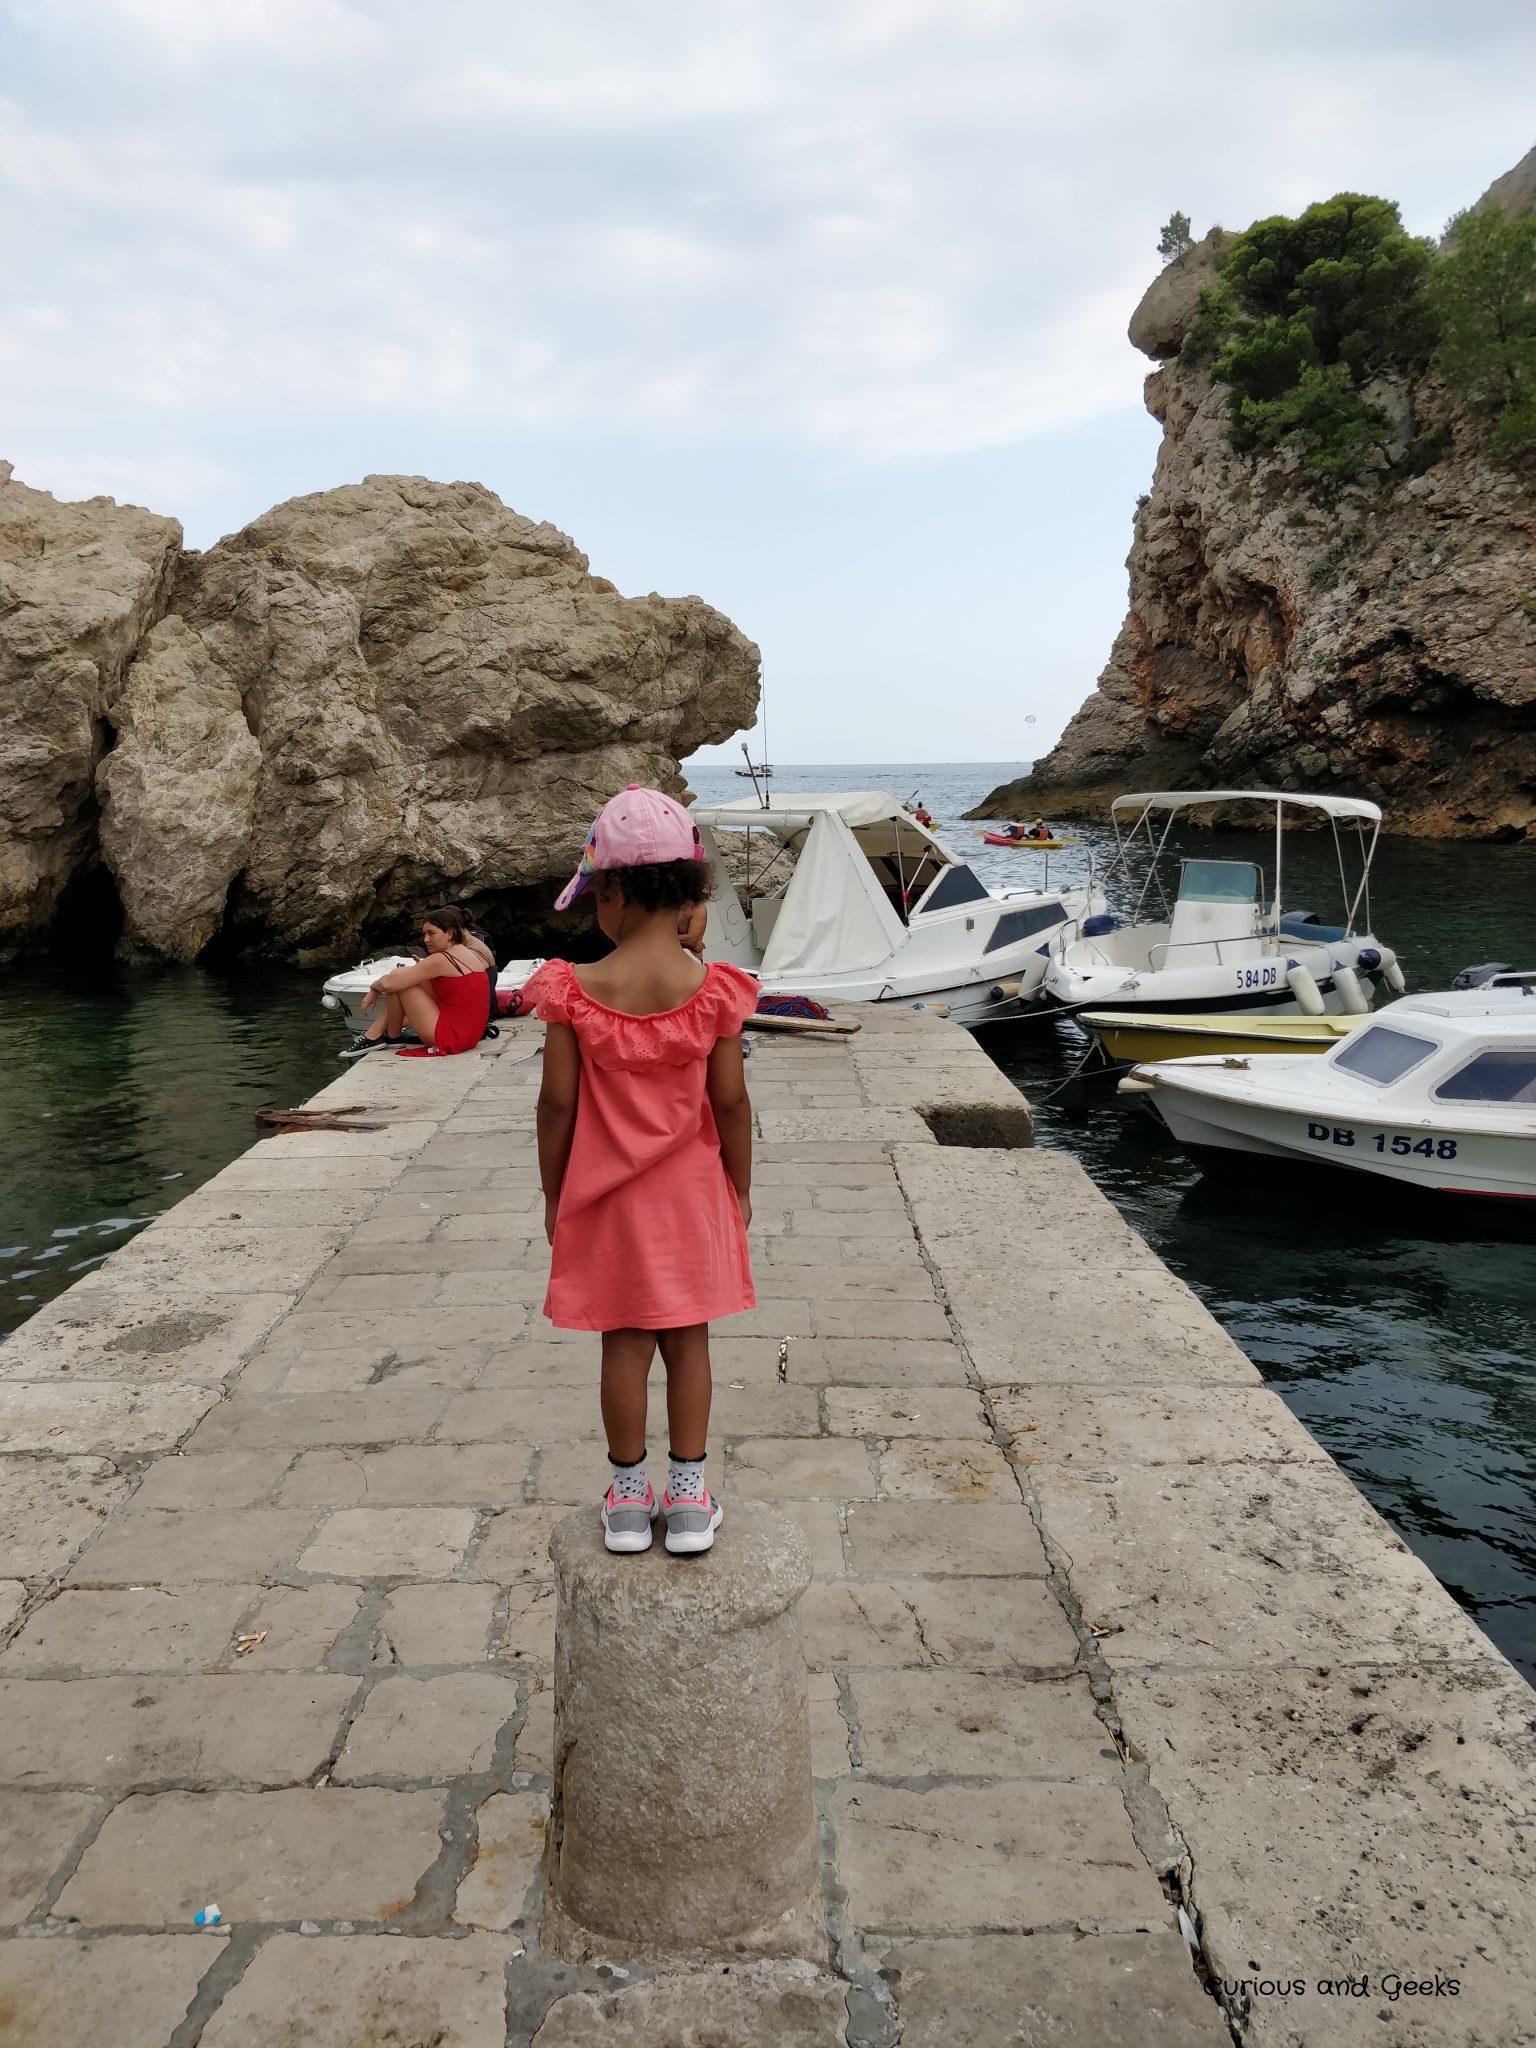 14. West Pier - Game of Thrones filming locations in Dubrovnik